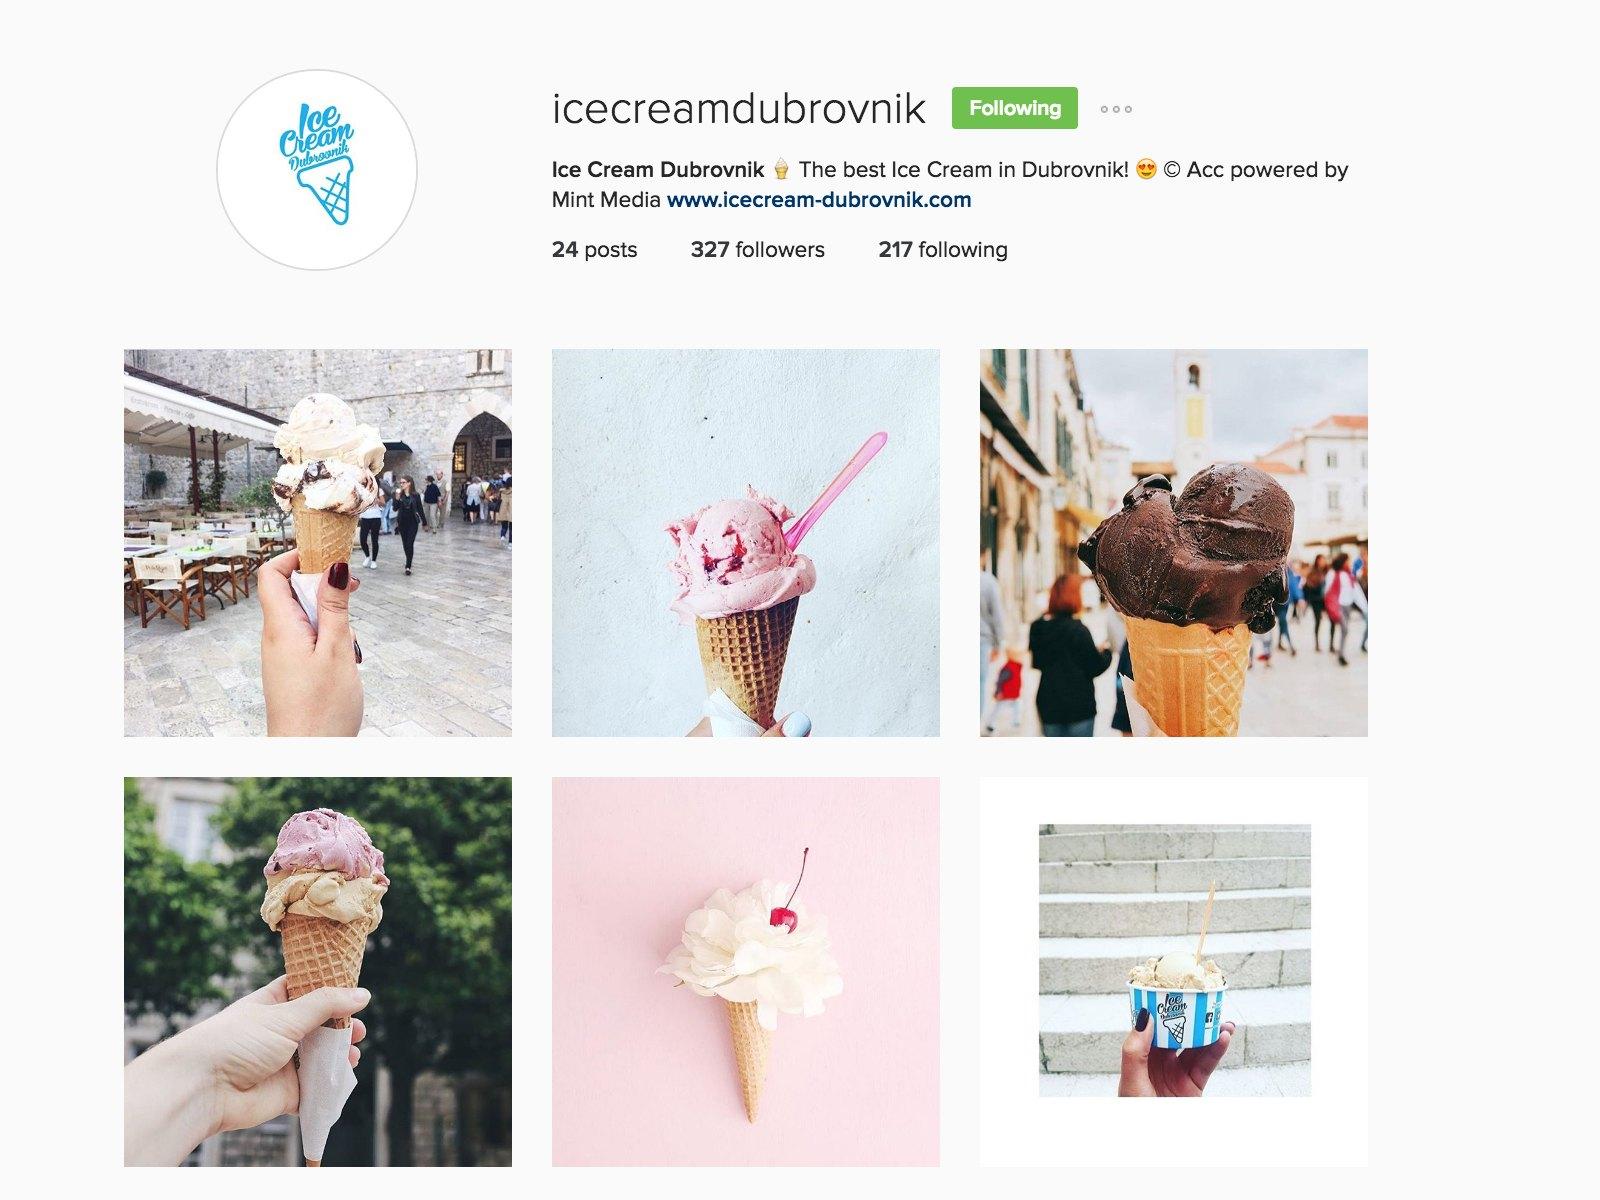 icecream dubrovnik instagram